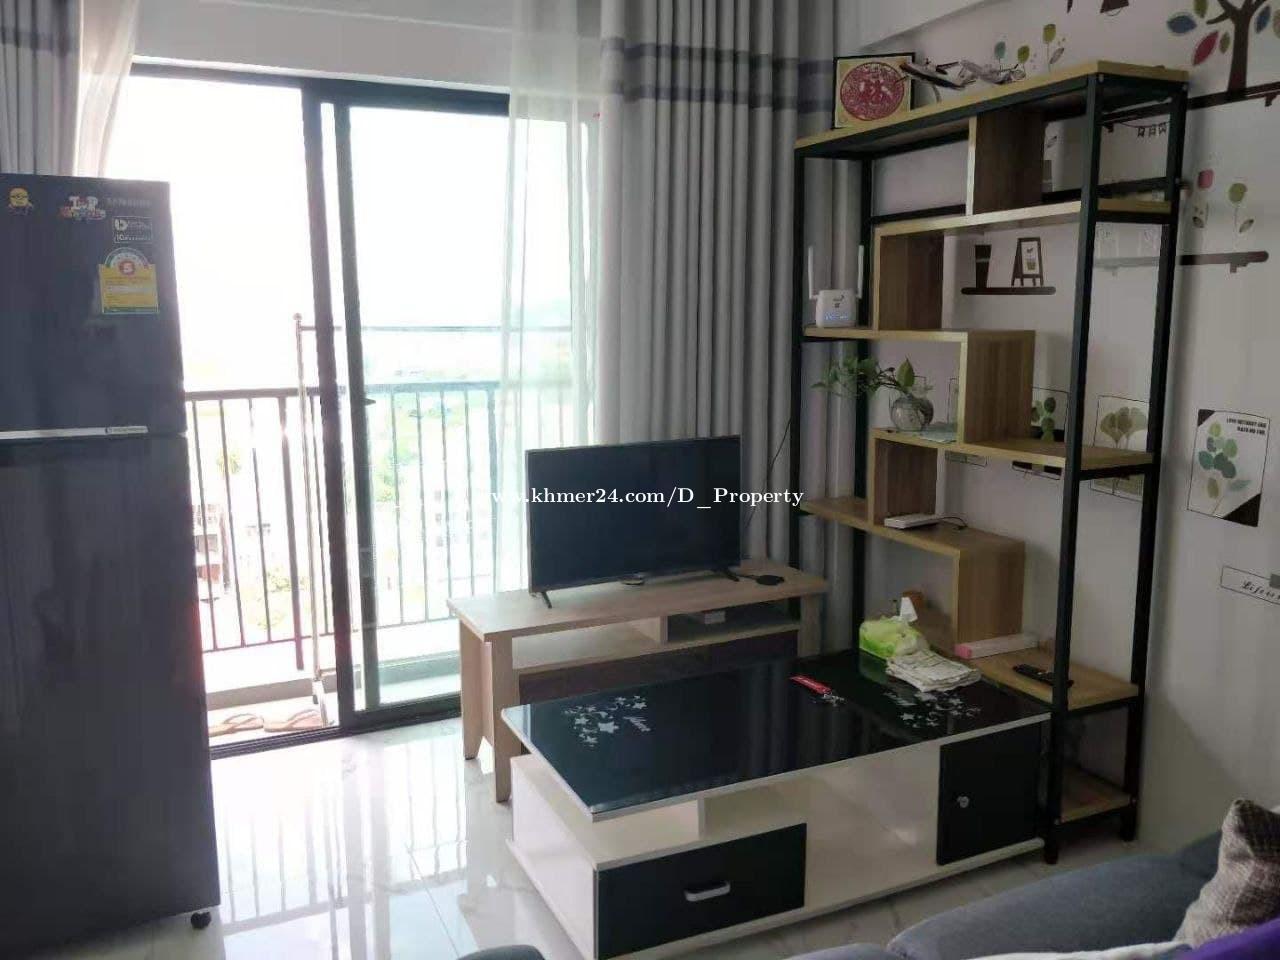 Modern Condo for Rent (2 Bedroom; SenSok)